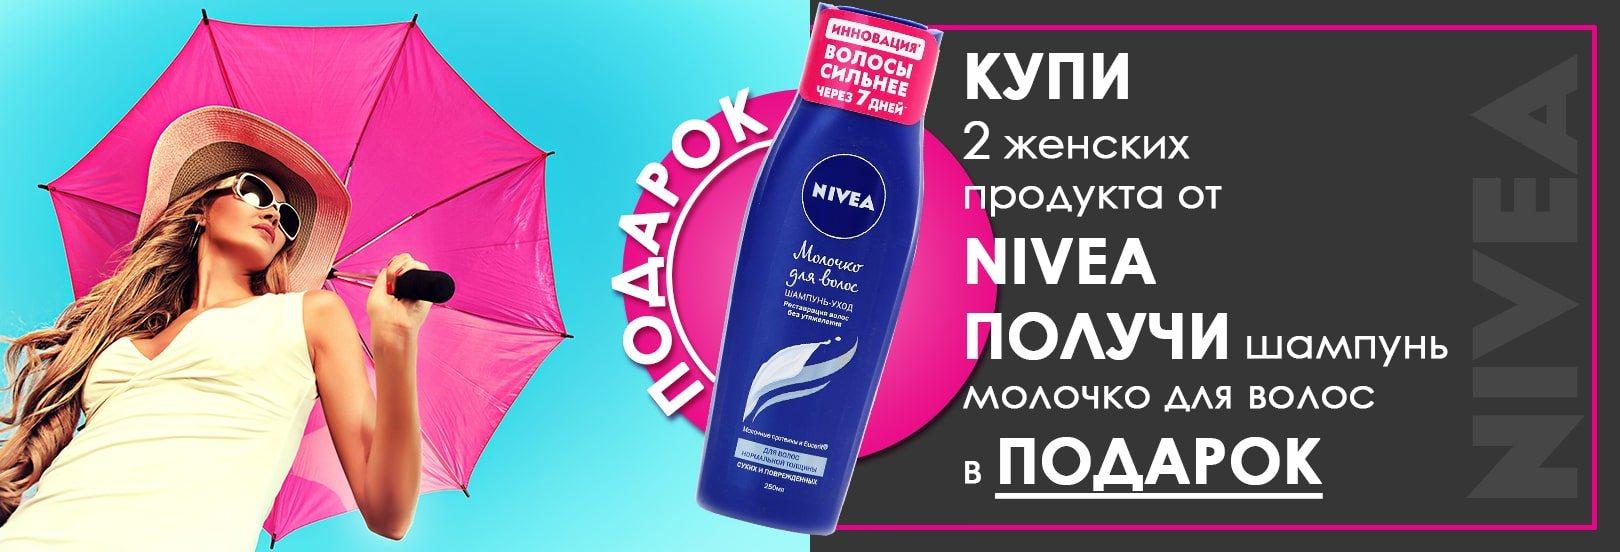 nivea - шамп в подарок